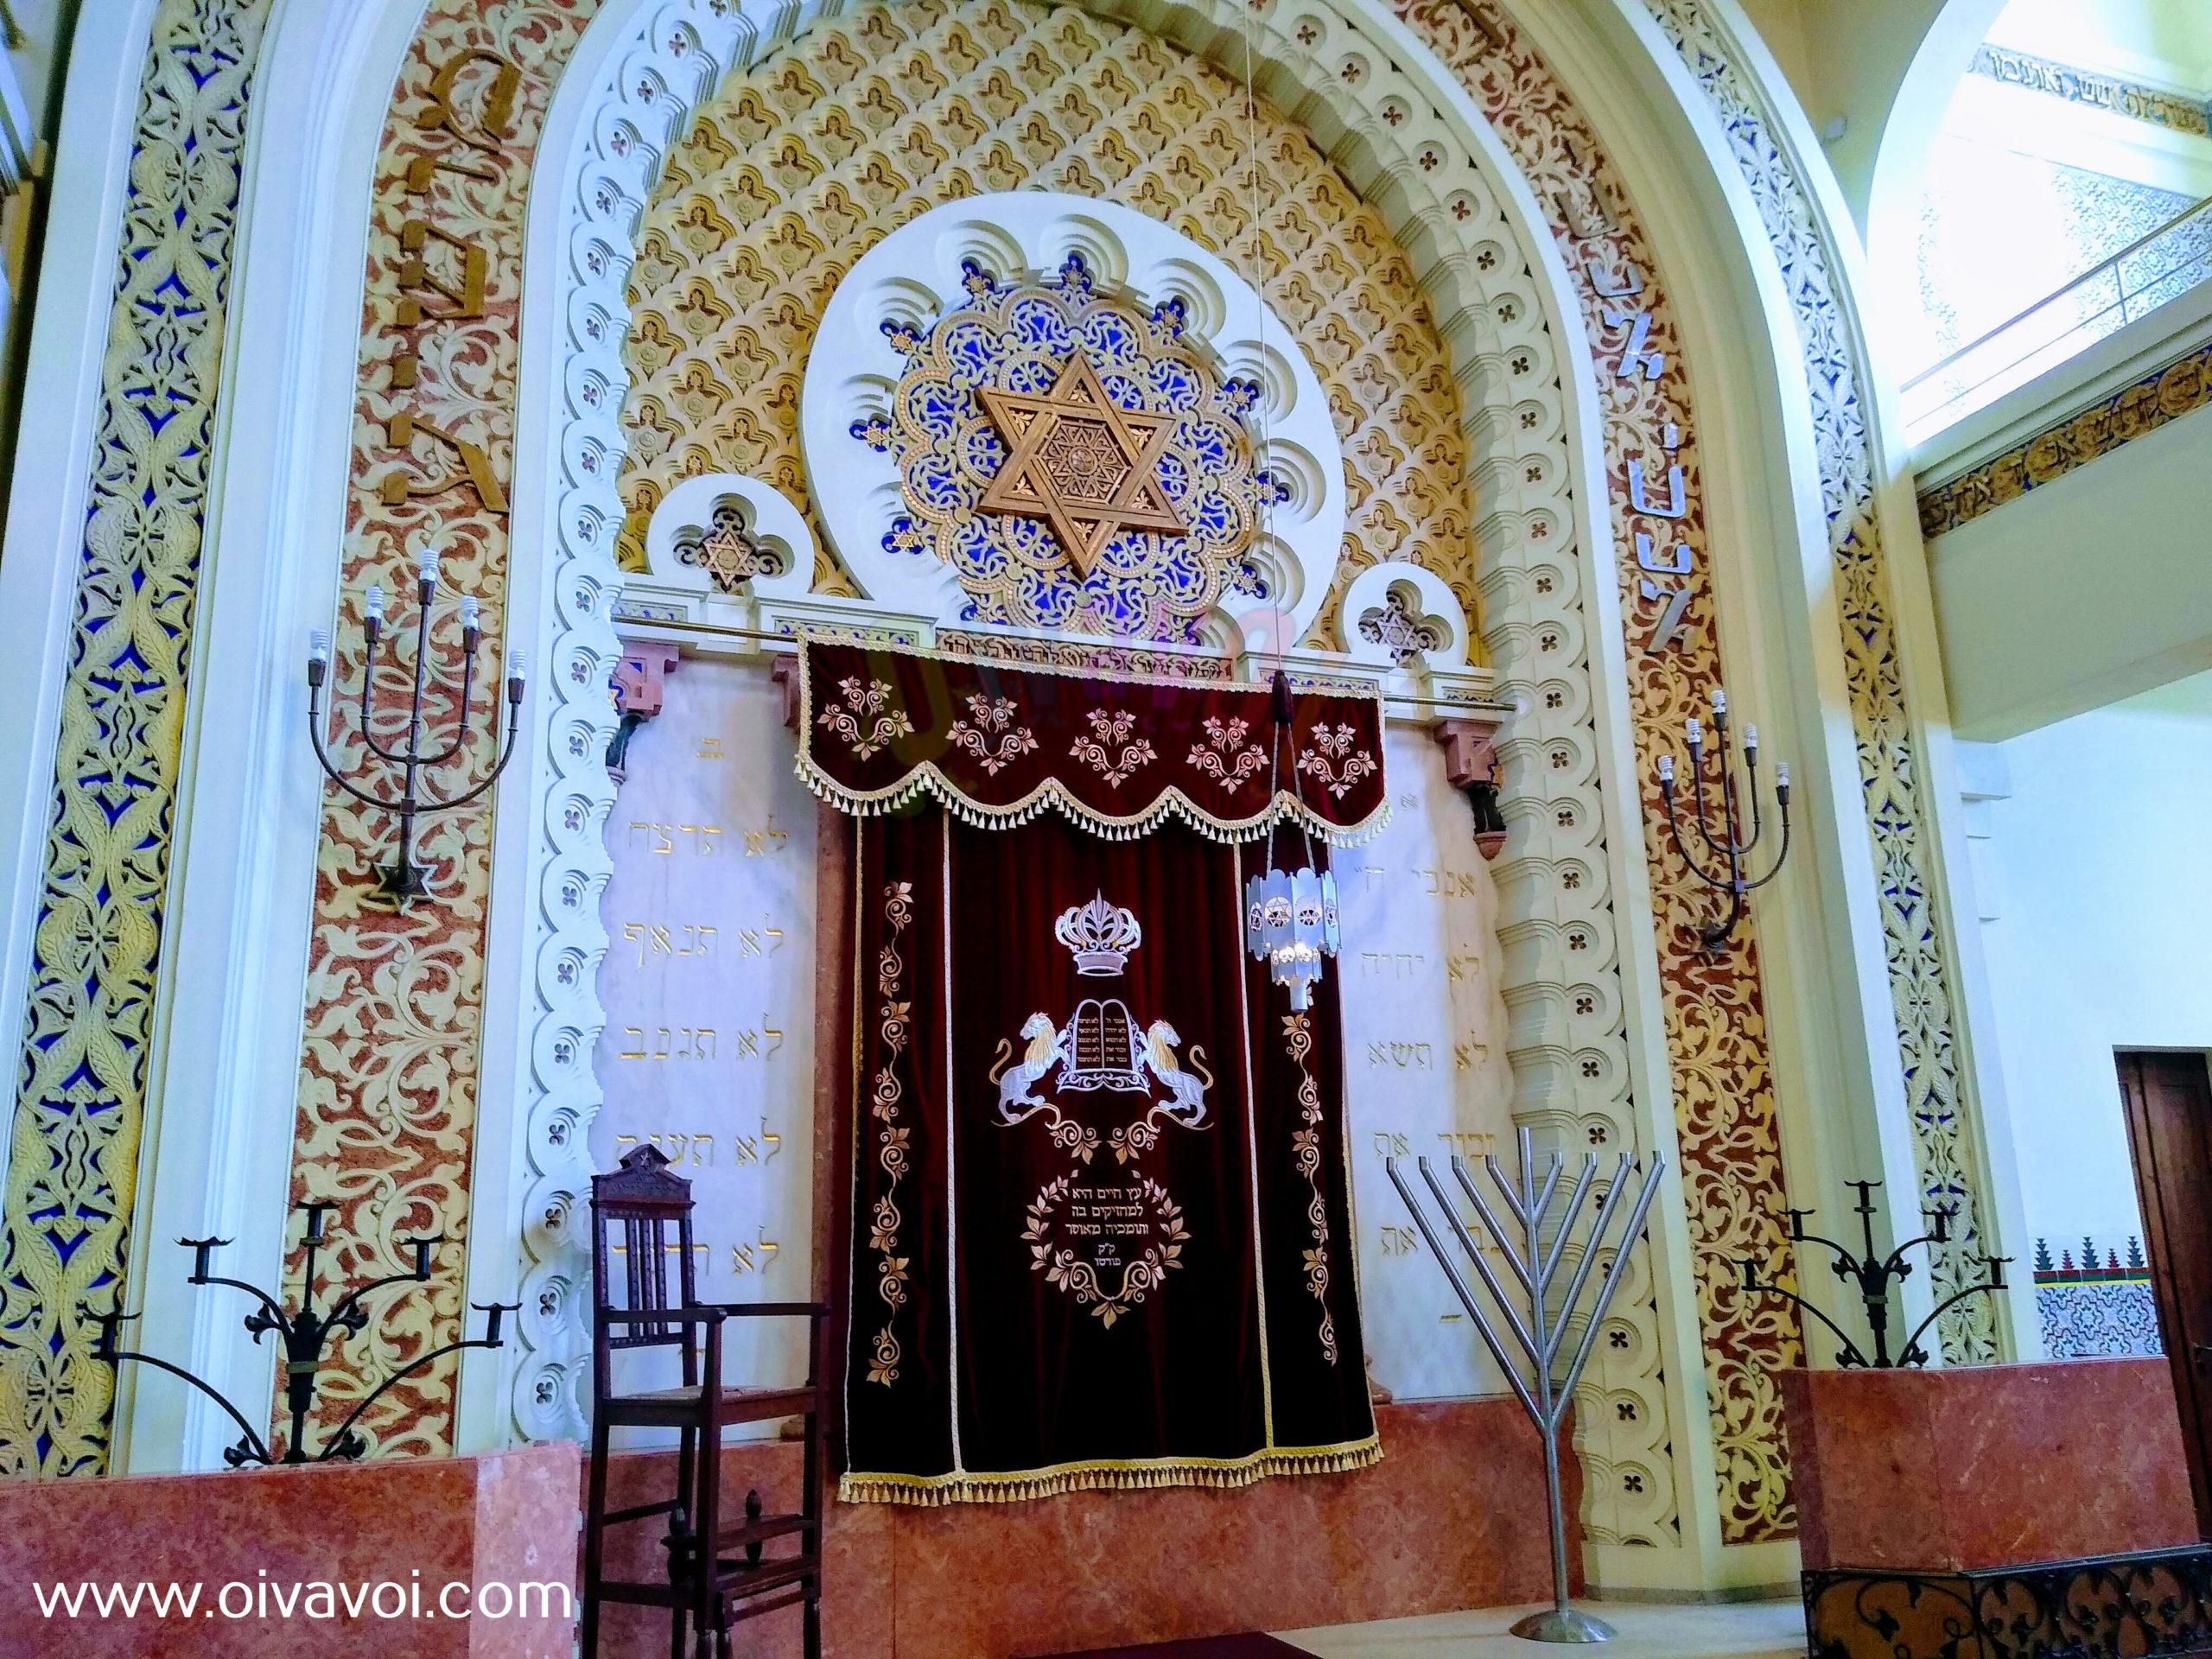 Interior de la sinagoga Kadoorie de Oporto